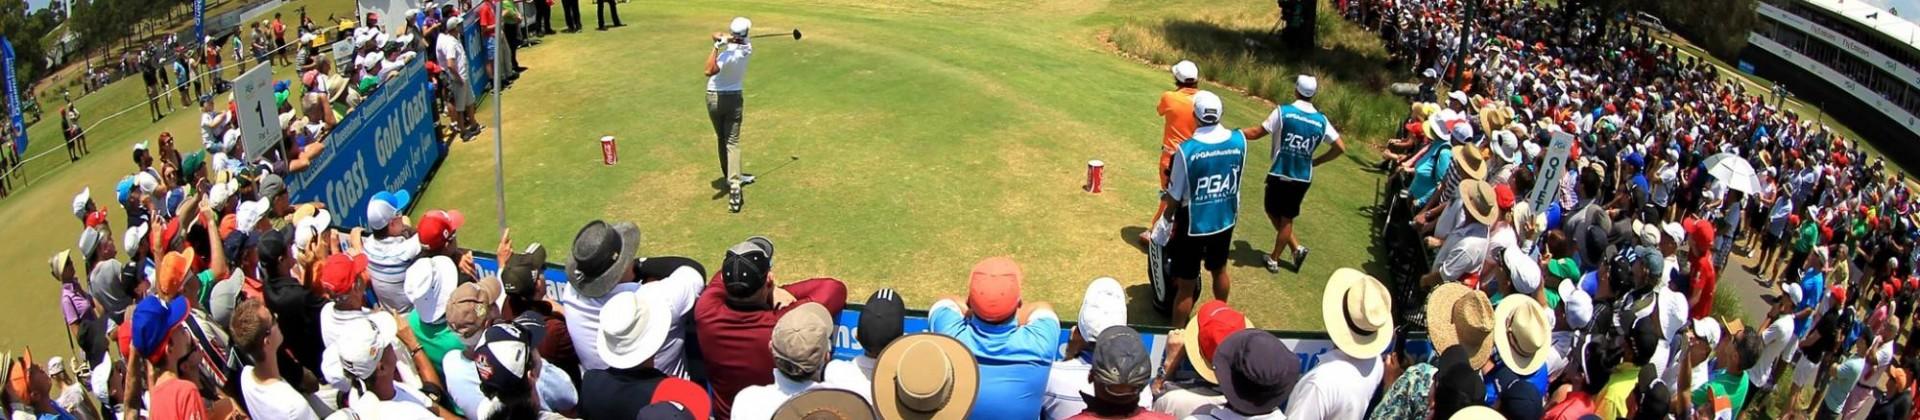 Australian PGA Championship -  3 to 6 December, 2015